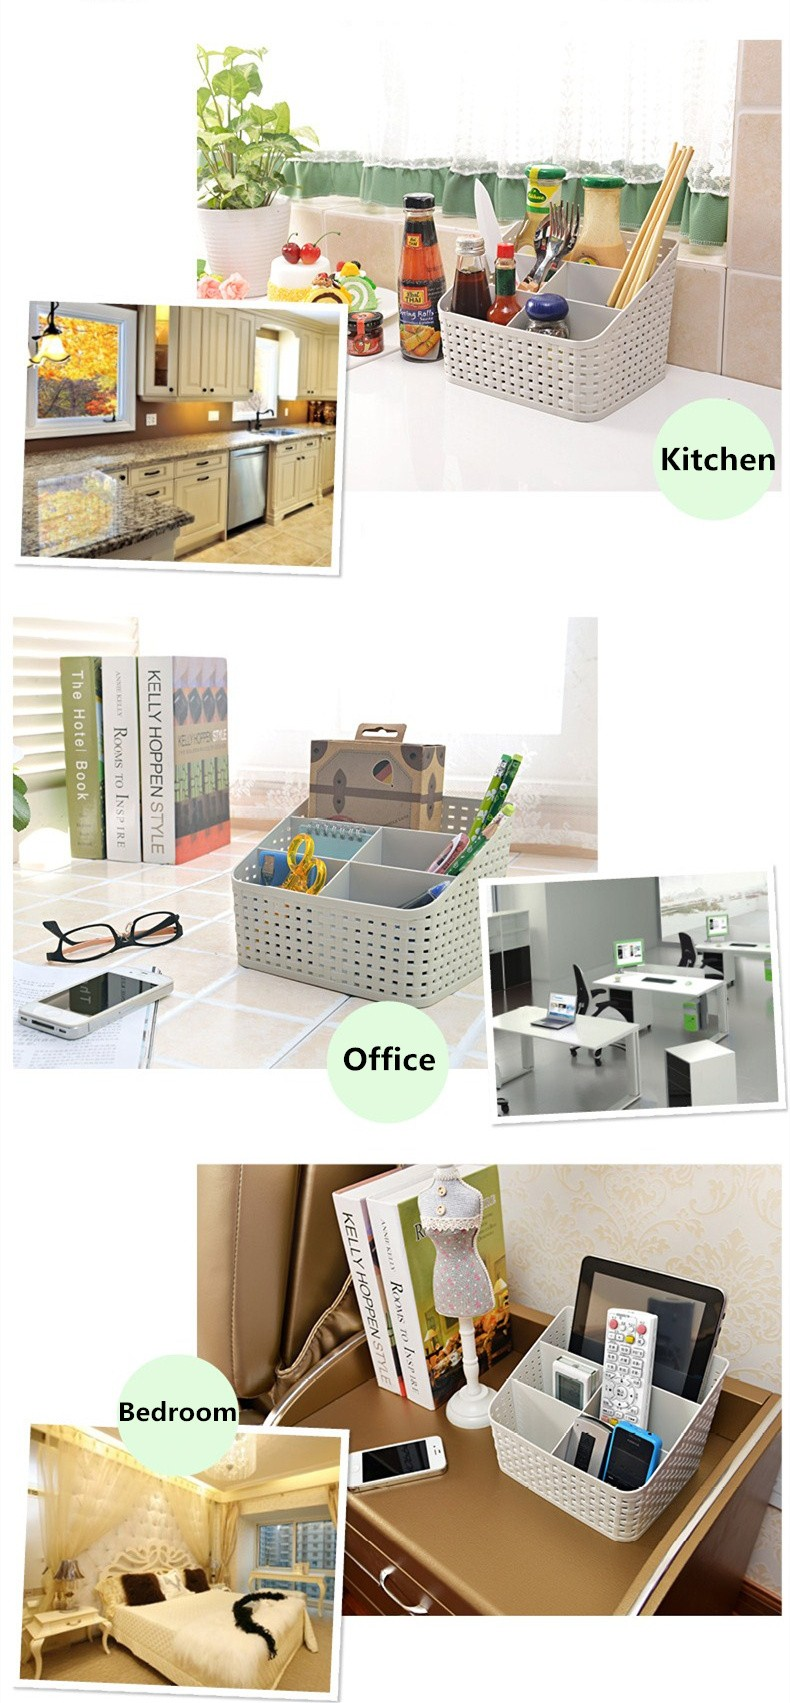 Simple life Desktop sundries pen pencil storage basket organizer vintage container storage basket plastic box storage box 3